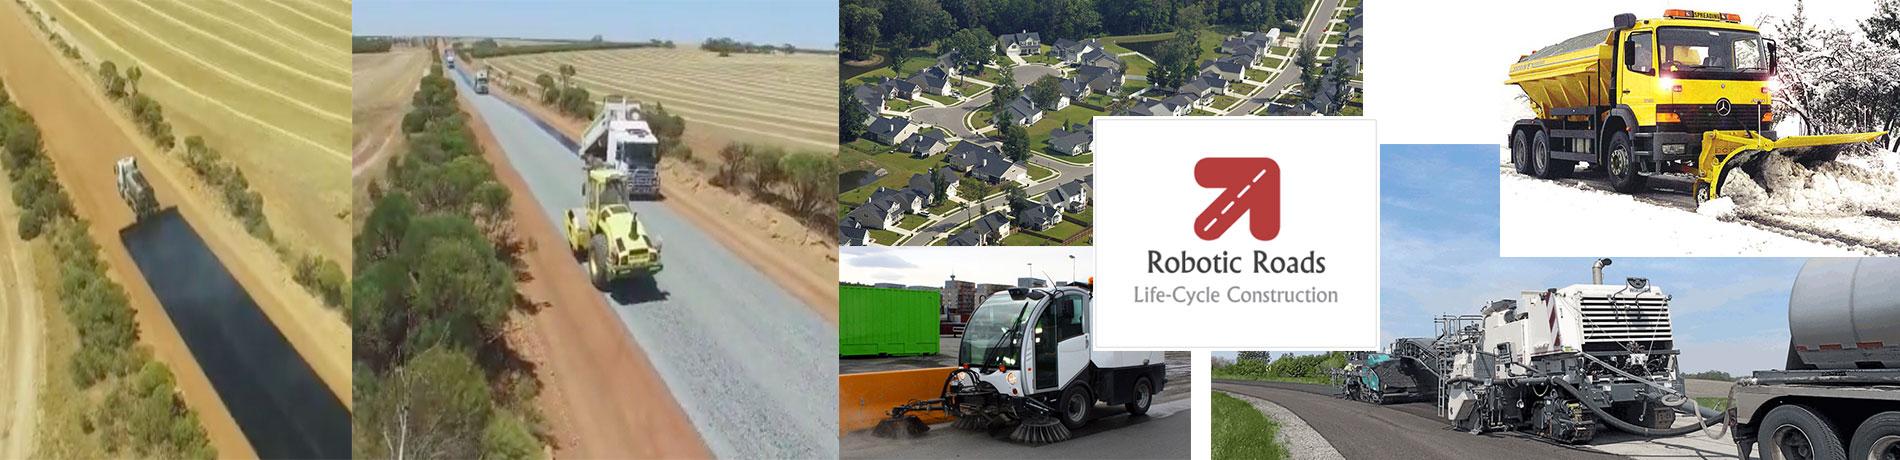 roadbots-banner